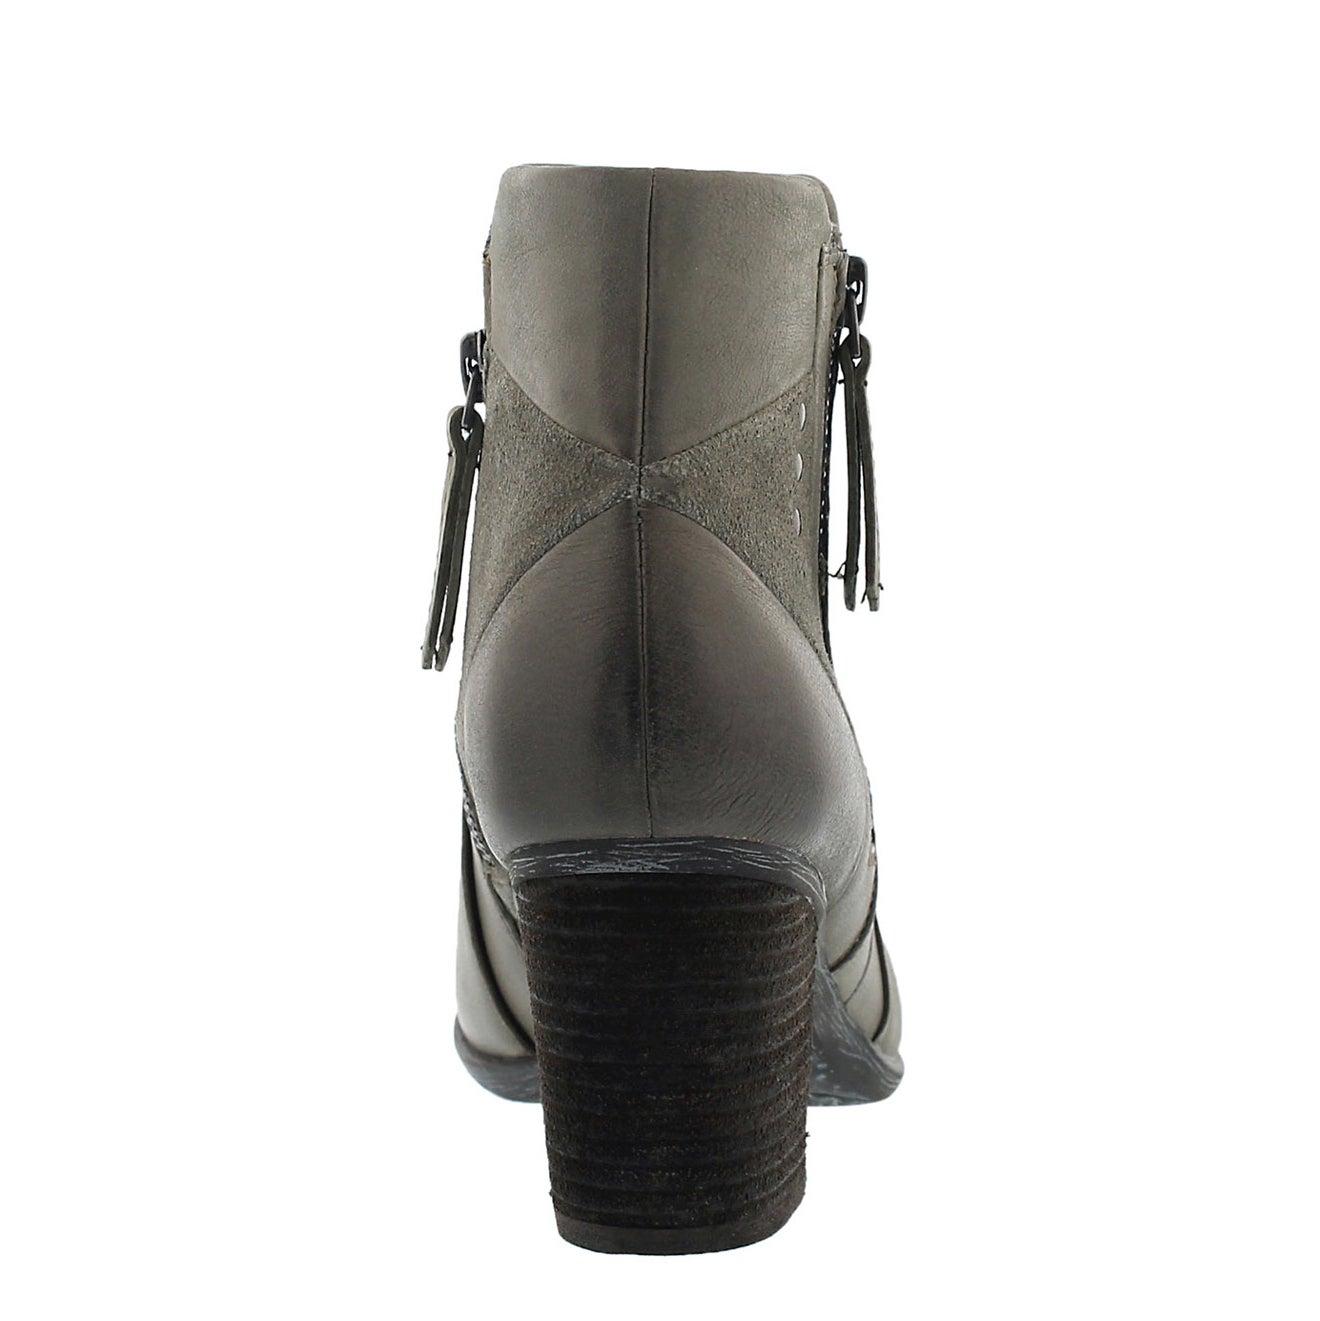 Lds Britney 41 olive lthr ankle boot